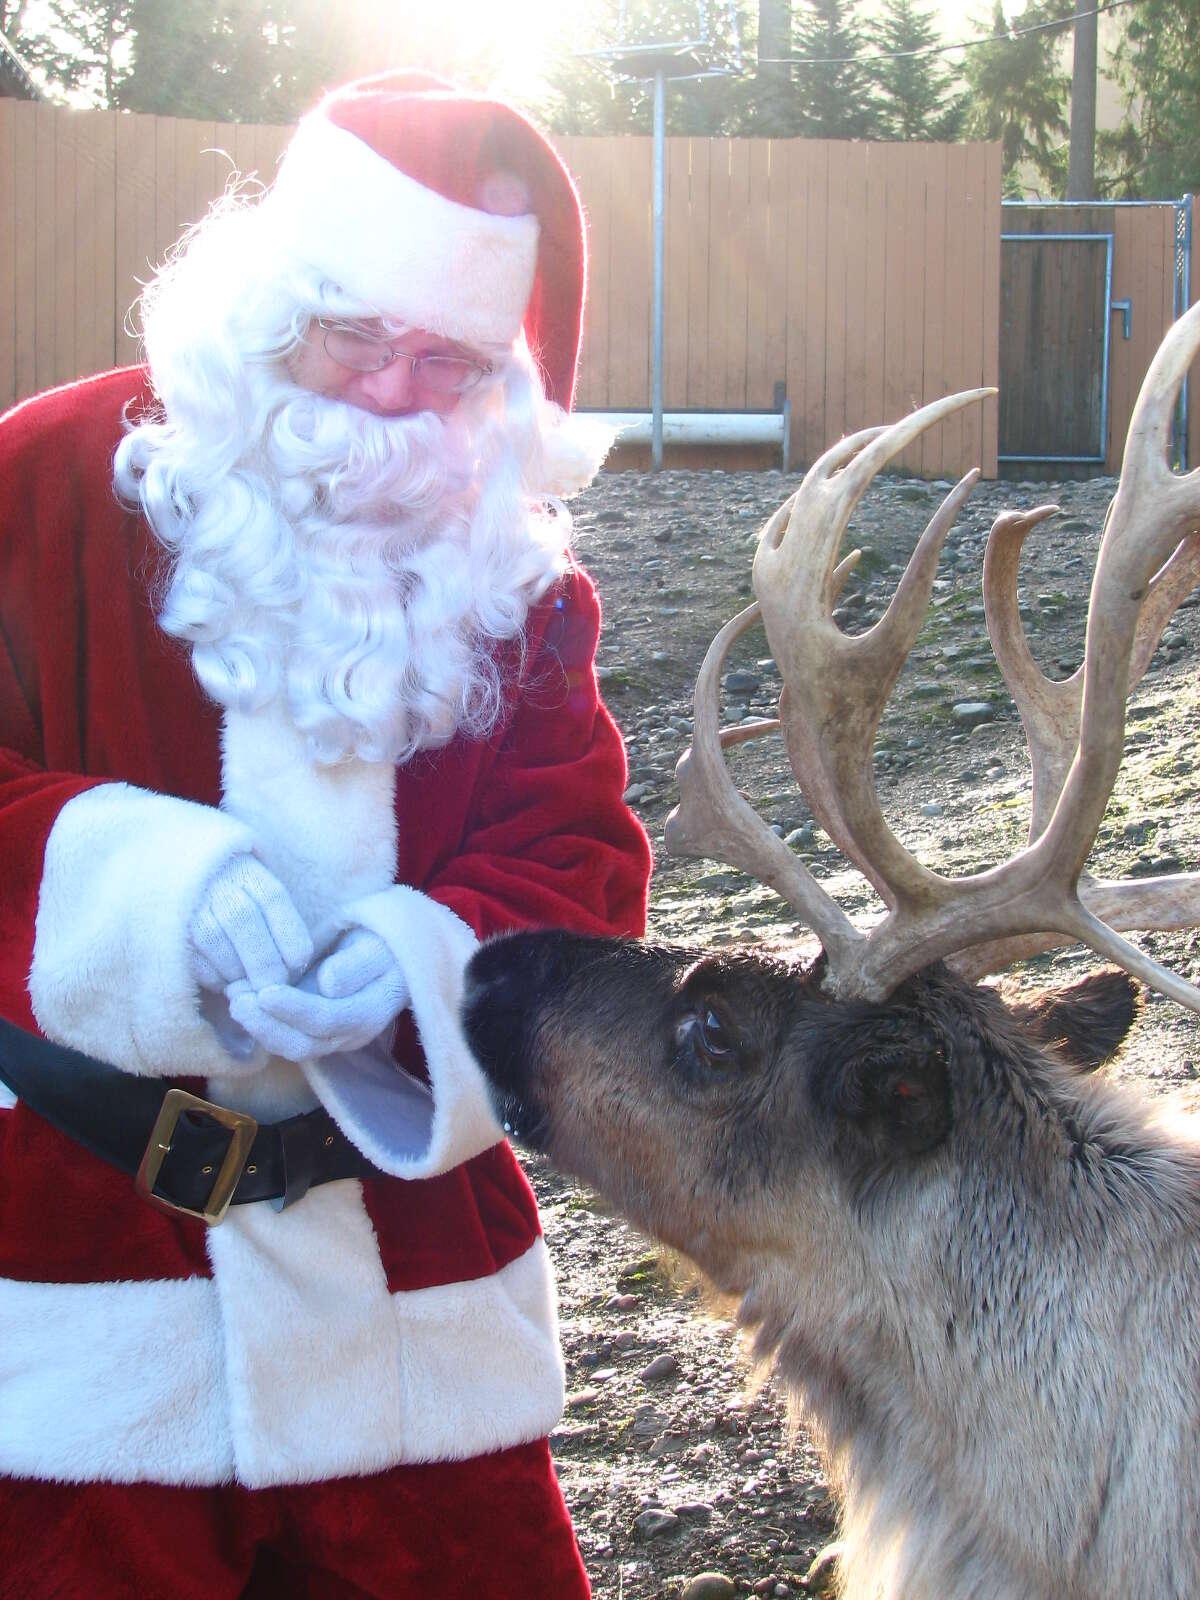 Issaquah Reindeer Festival: Now through Dec. 23